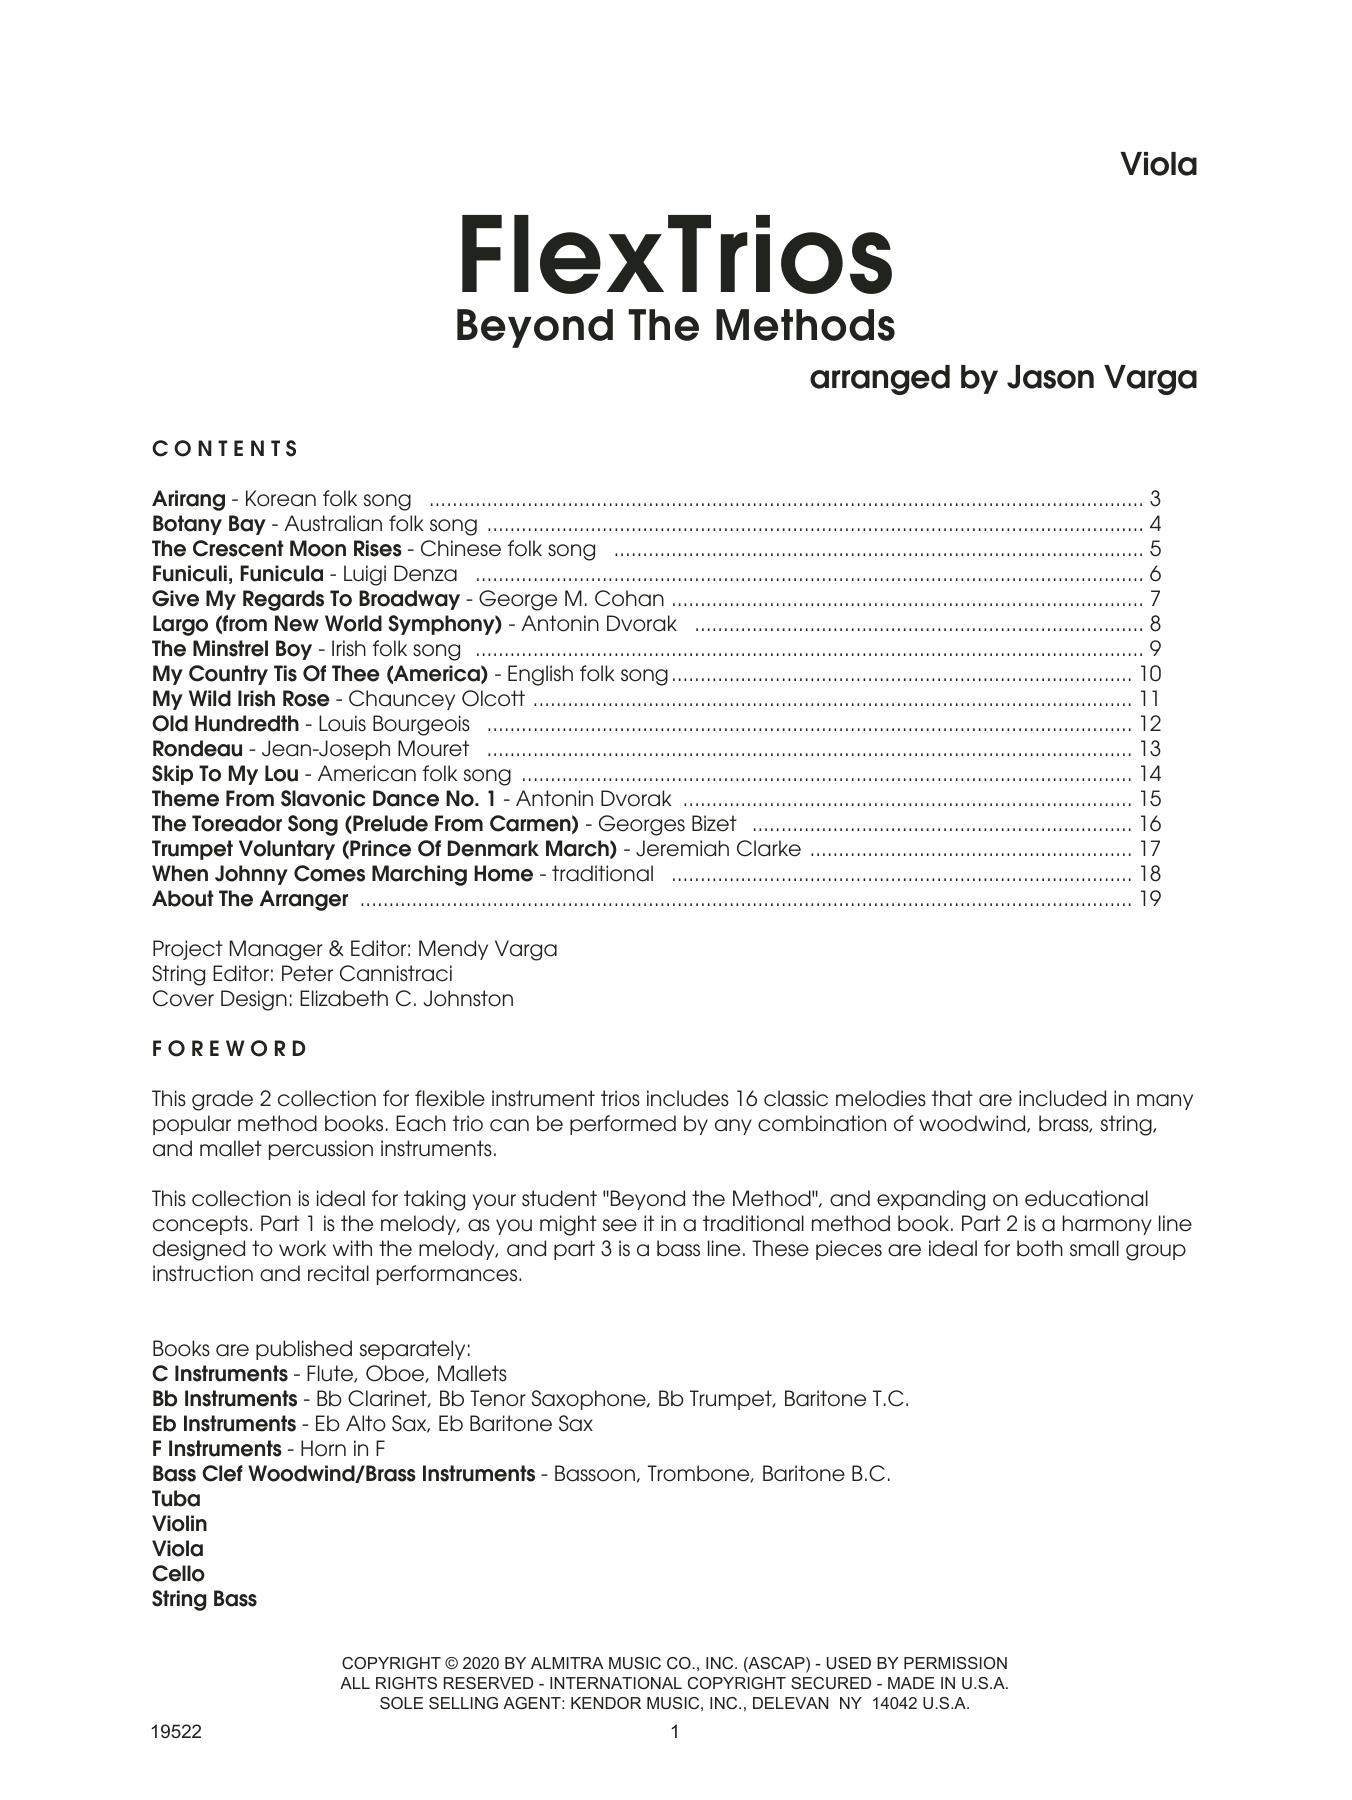 Jason Varga Flextrios - Beyond The Methods (16 Pieces) - Viola sheet music notes printable PDF score